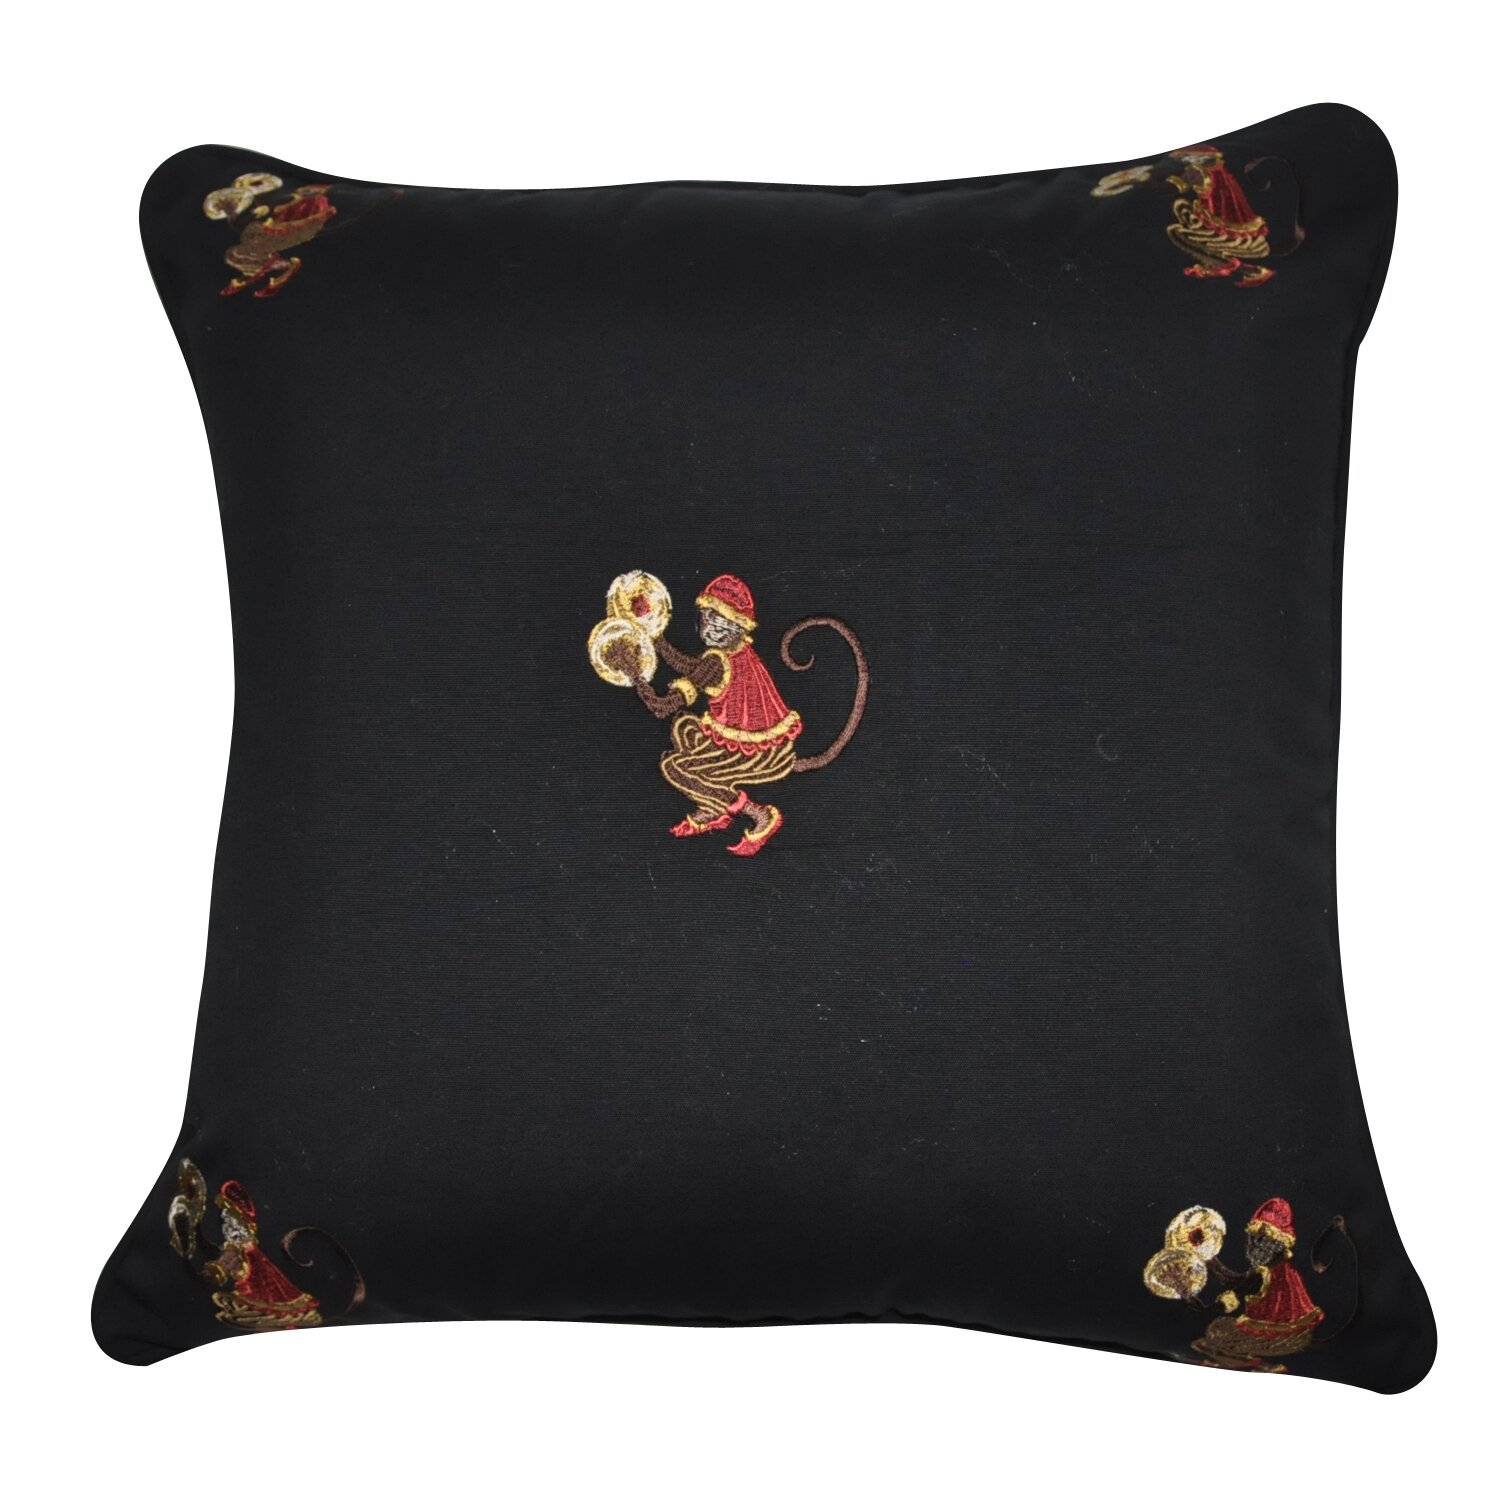 Black Cotton Throw Pillows : Loom and Mill Decorative Cotton Throw Pillow & Reviews Wayfair